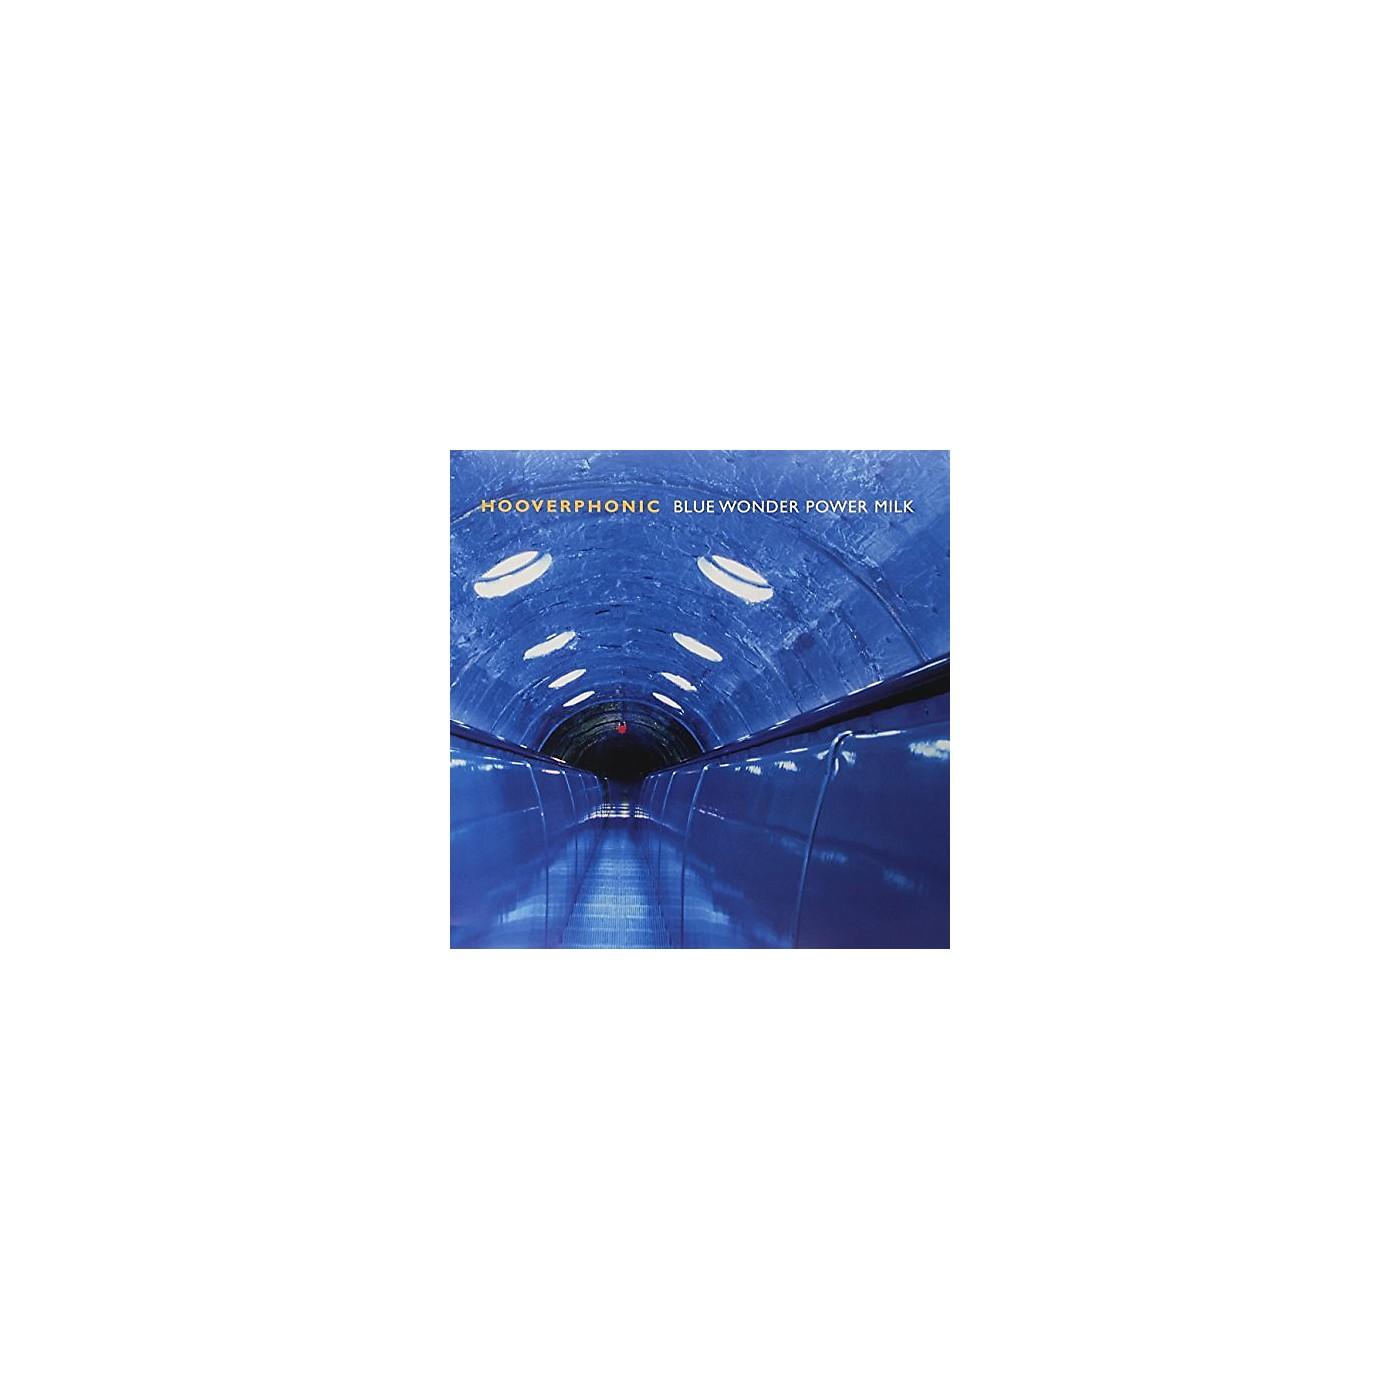 Alliance Hooverphonic - Blue Wonder Power Milk thumbnail